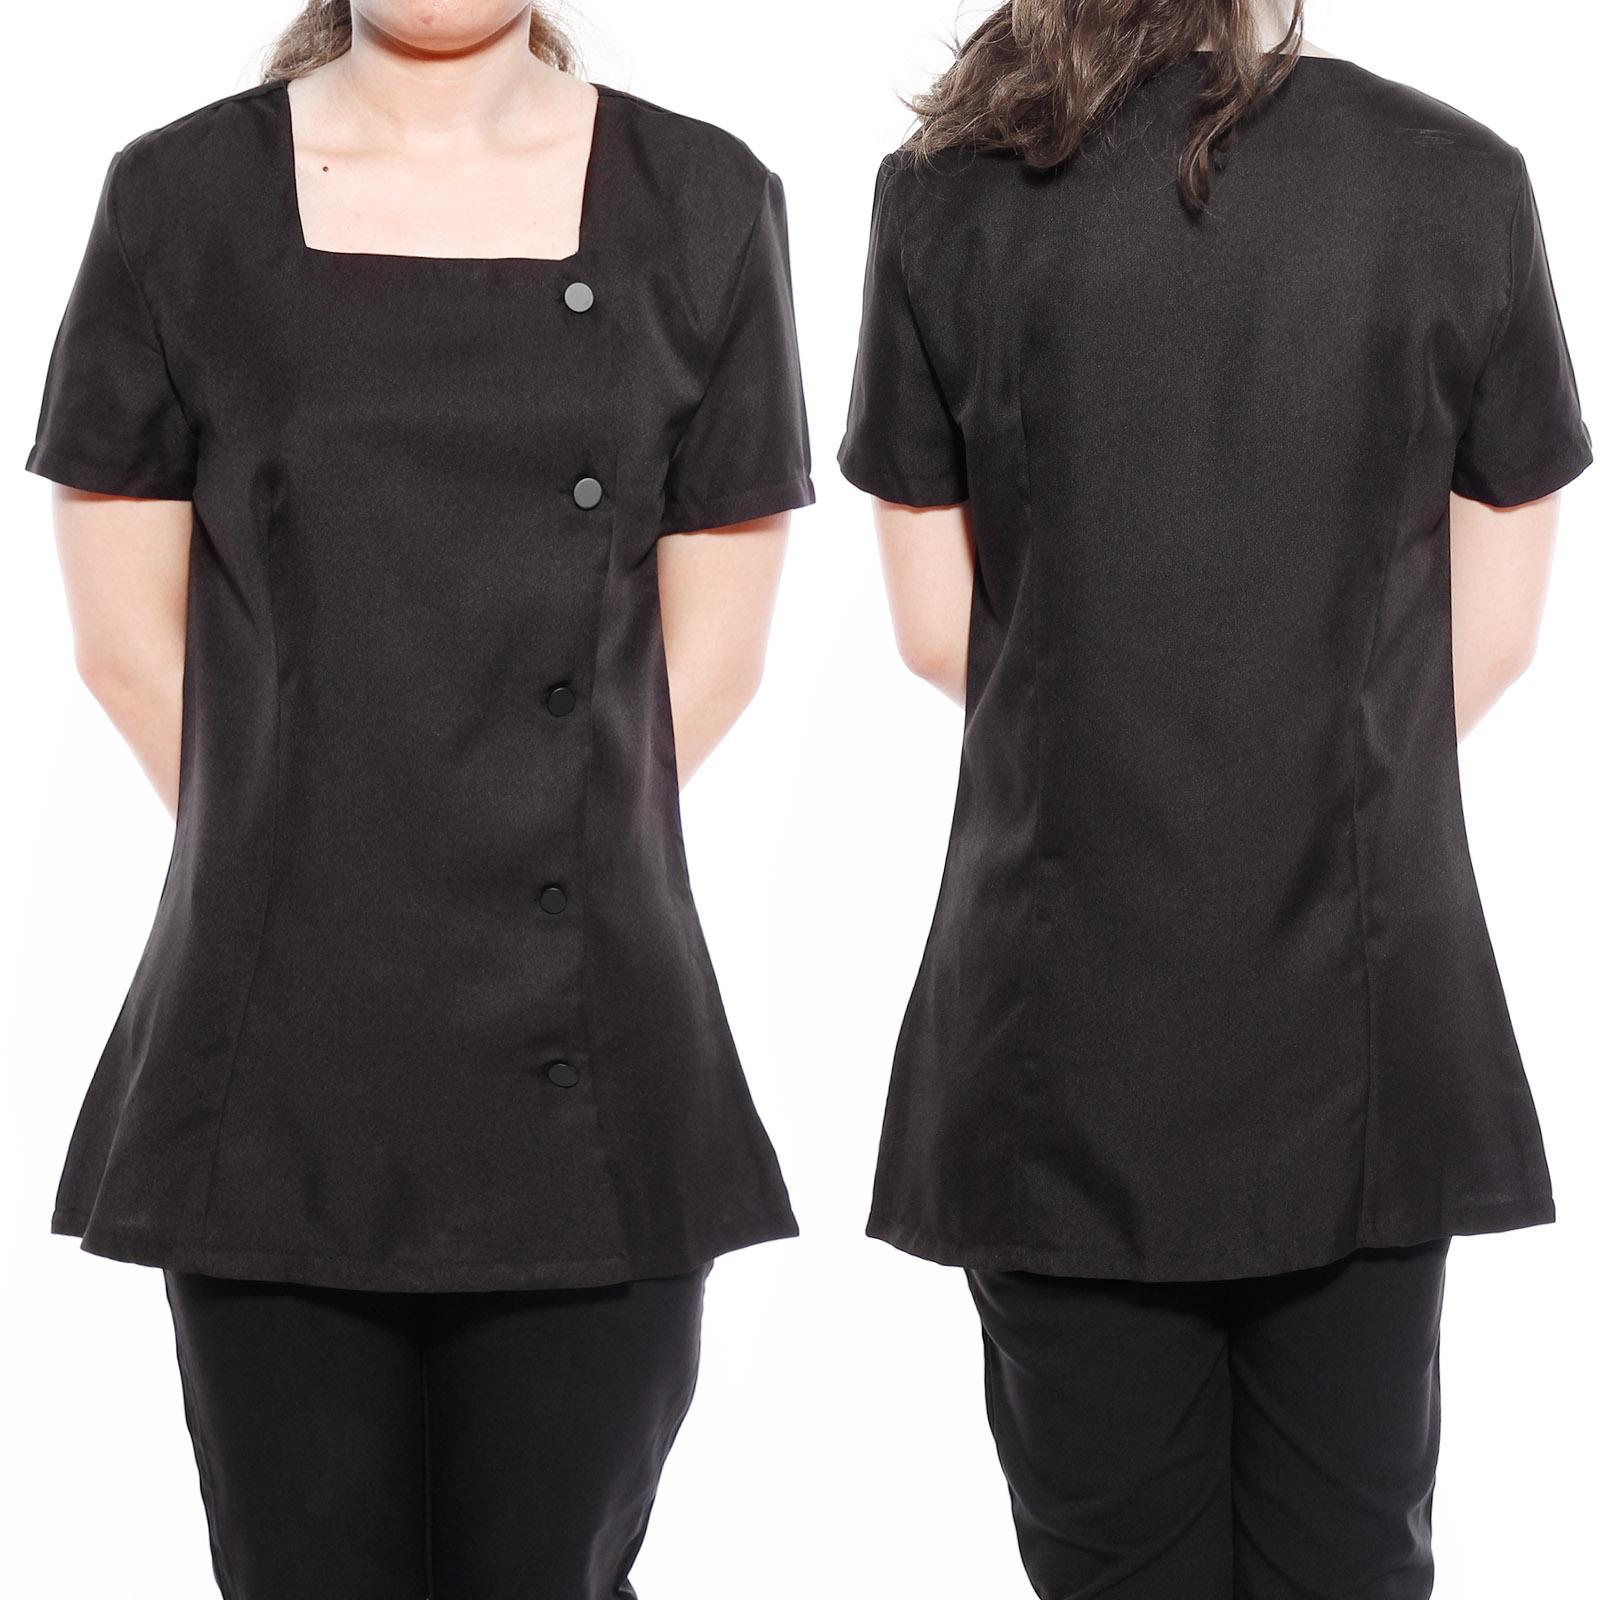 Beauty tunic spa massage therapist health carer work wear for Uniform nail spa